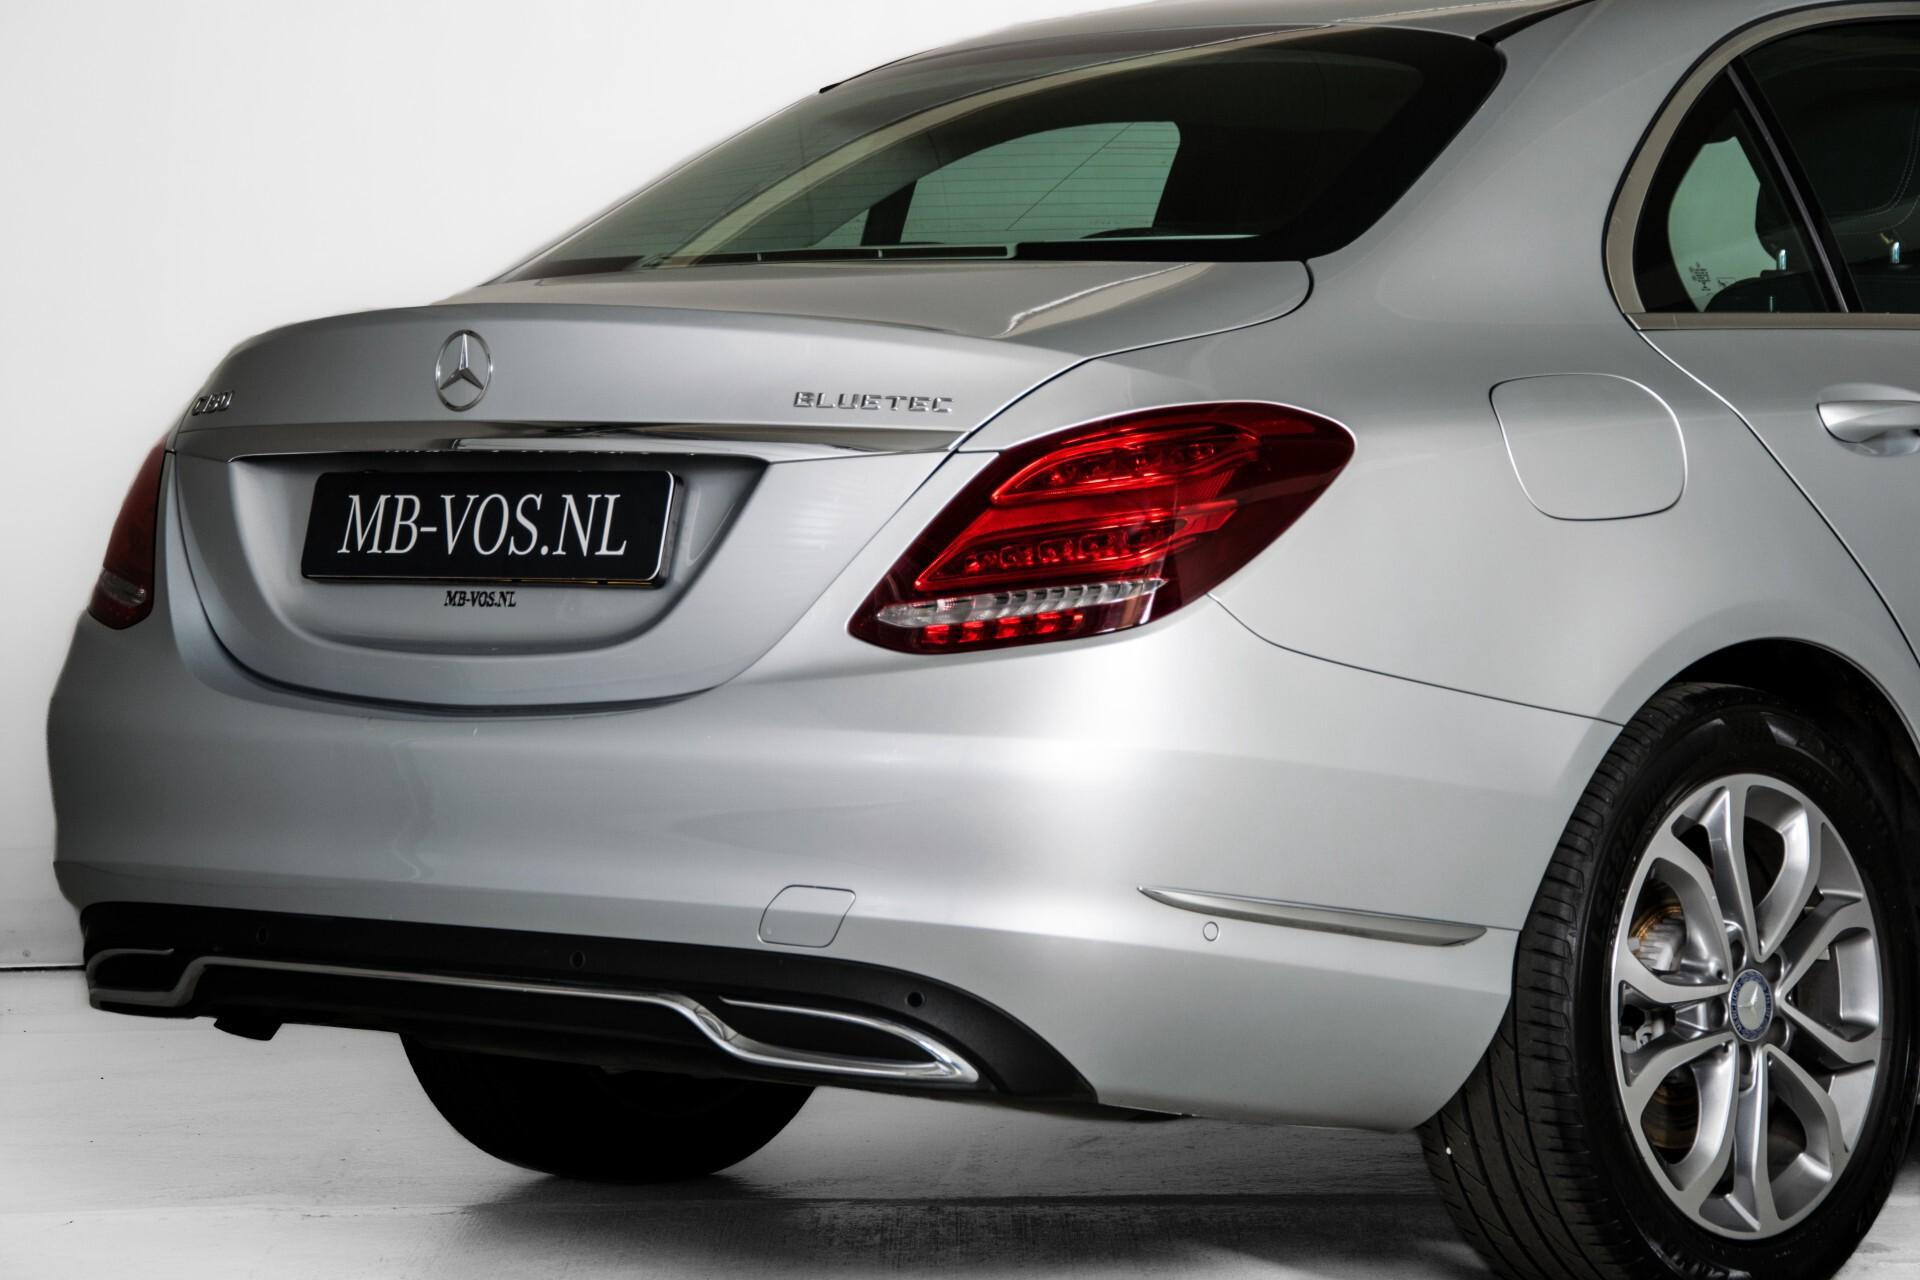 Mercedes-Benz C-Klasse 180 Bluetec Lease Edition Intelligent Light System/Cruise Control/Navi Foto 41